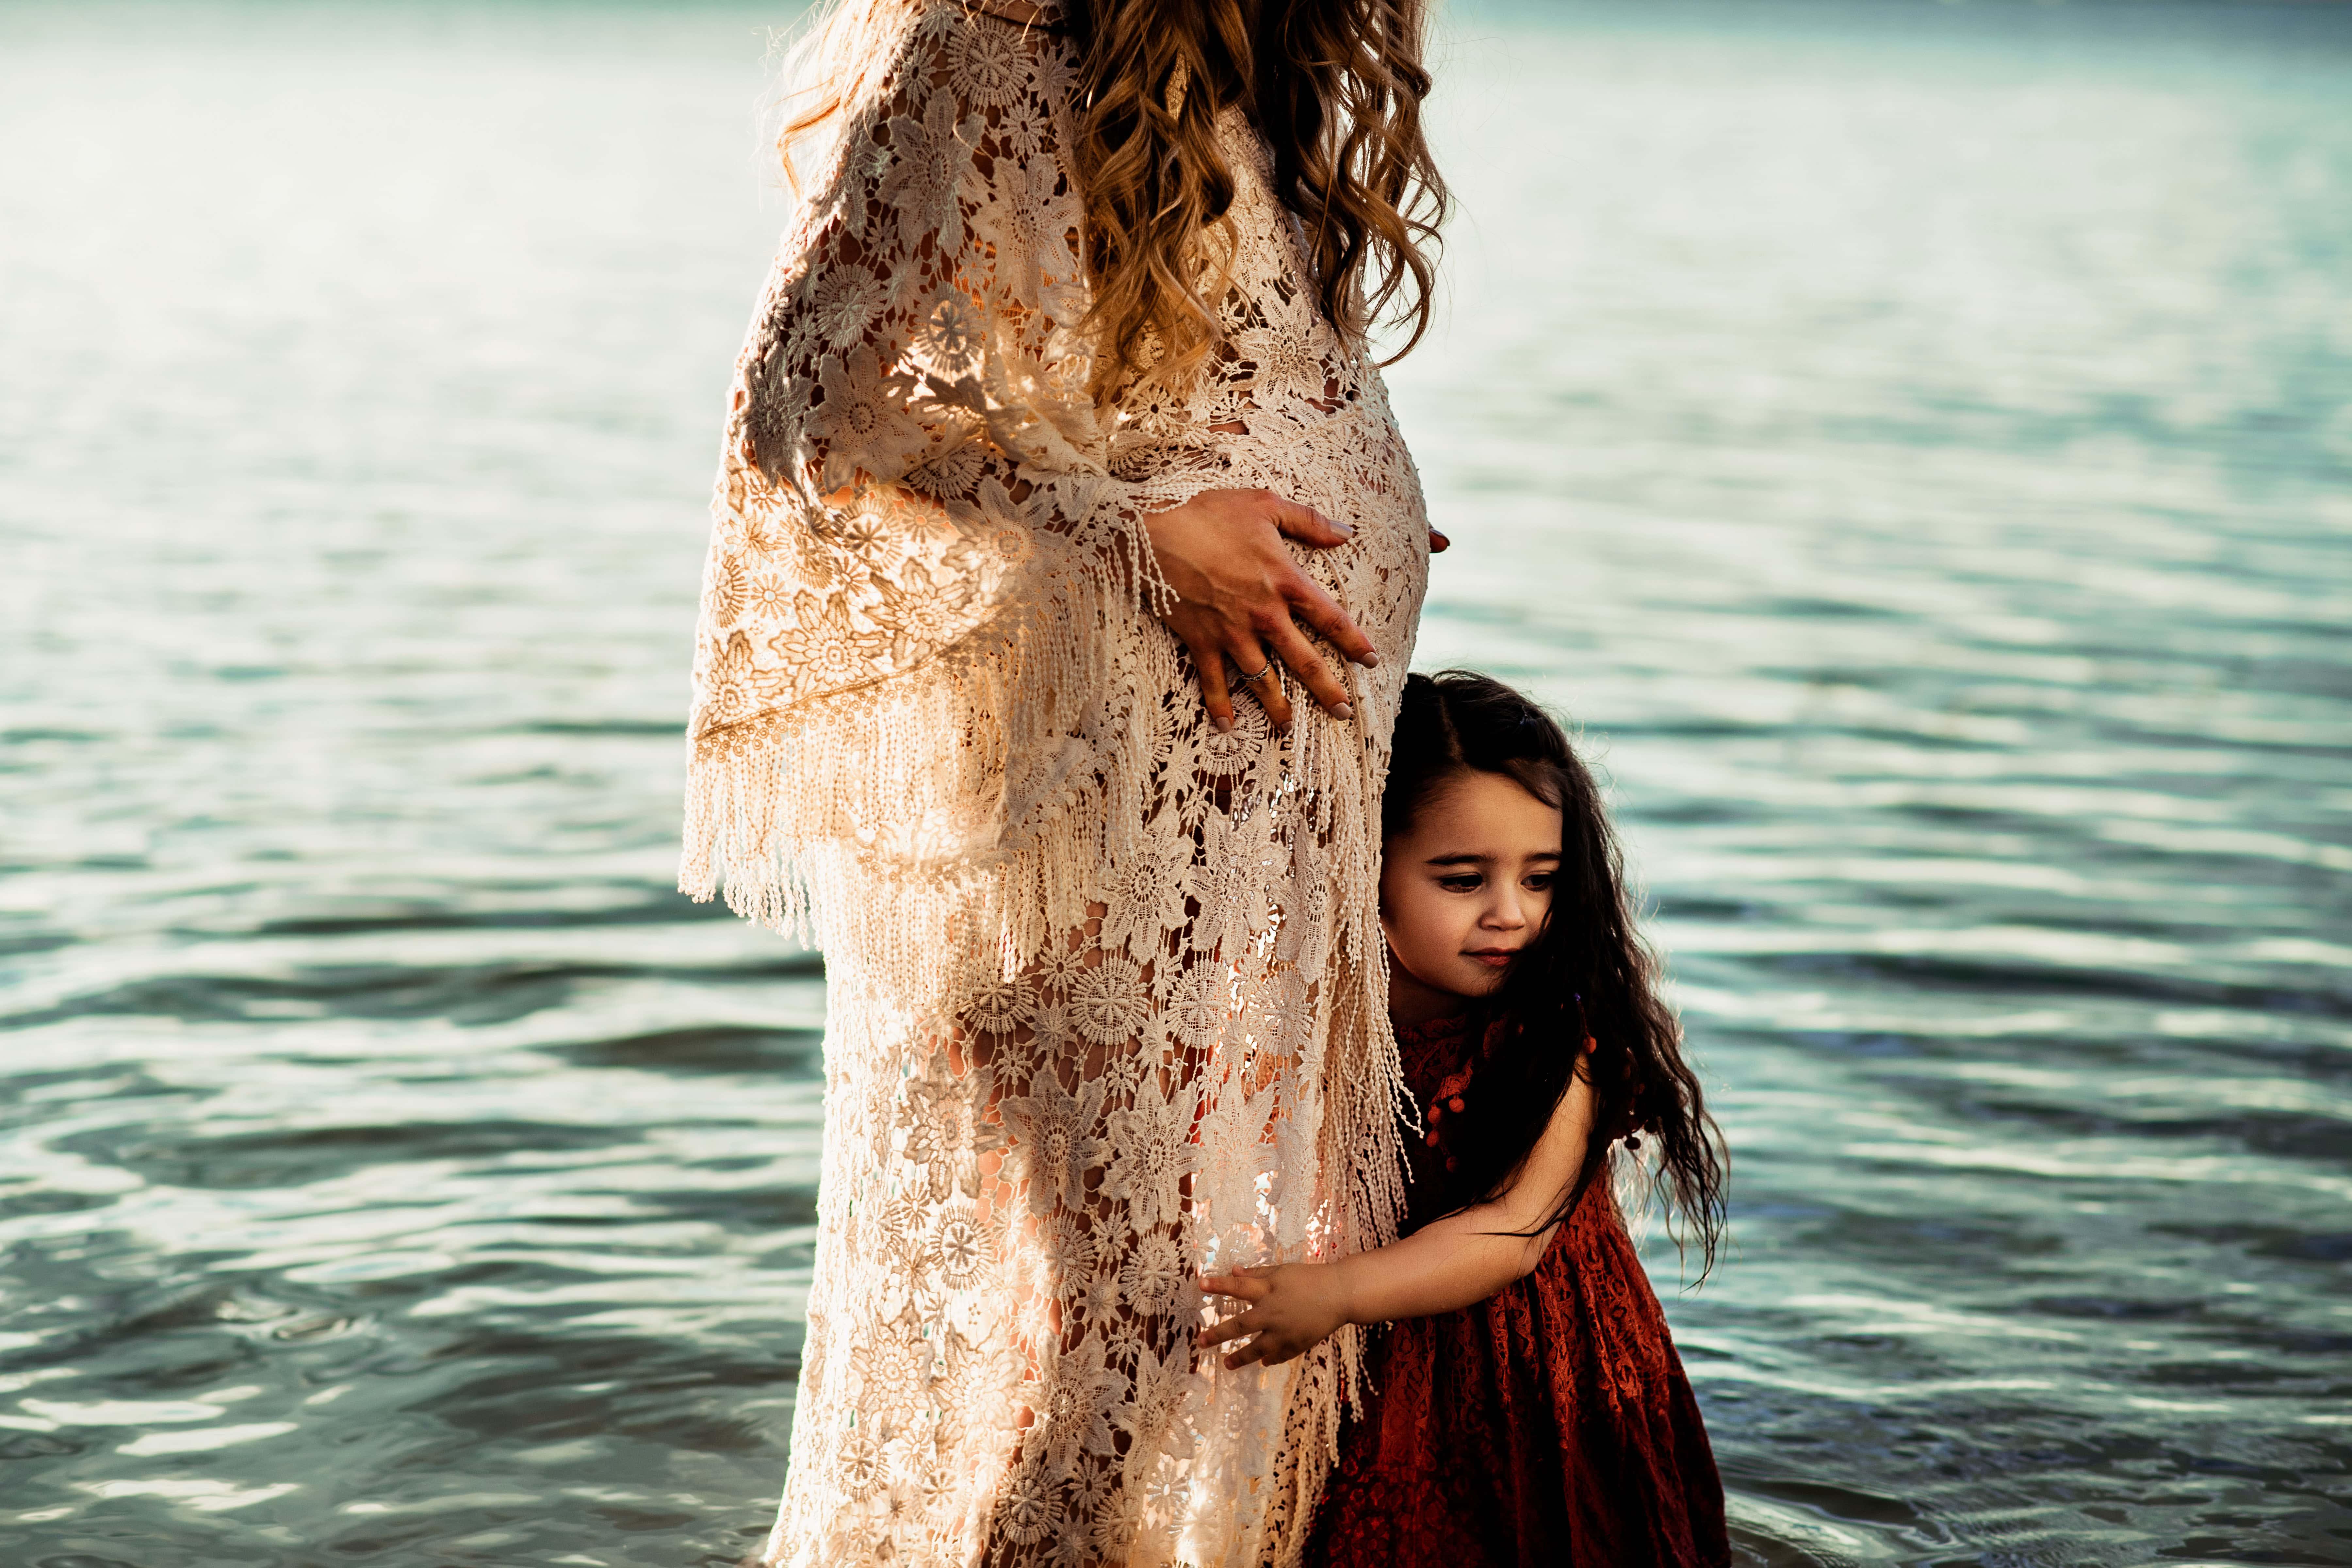 pregnancy photographer, colorado photographer, denver maternity photos, maternity photography